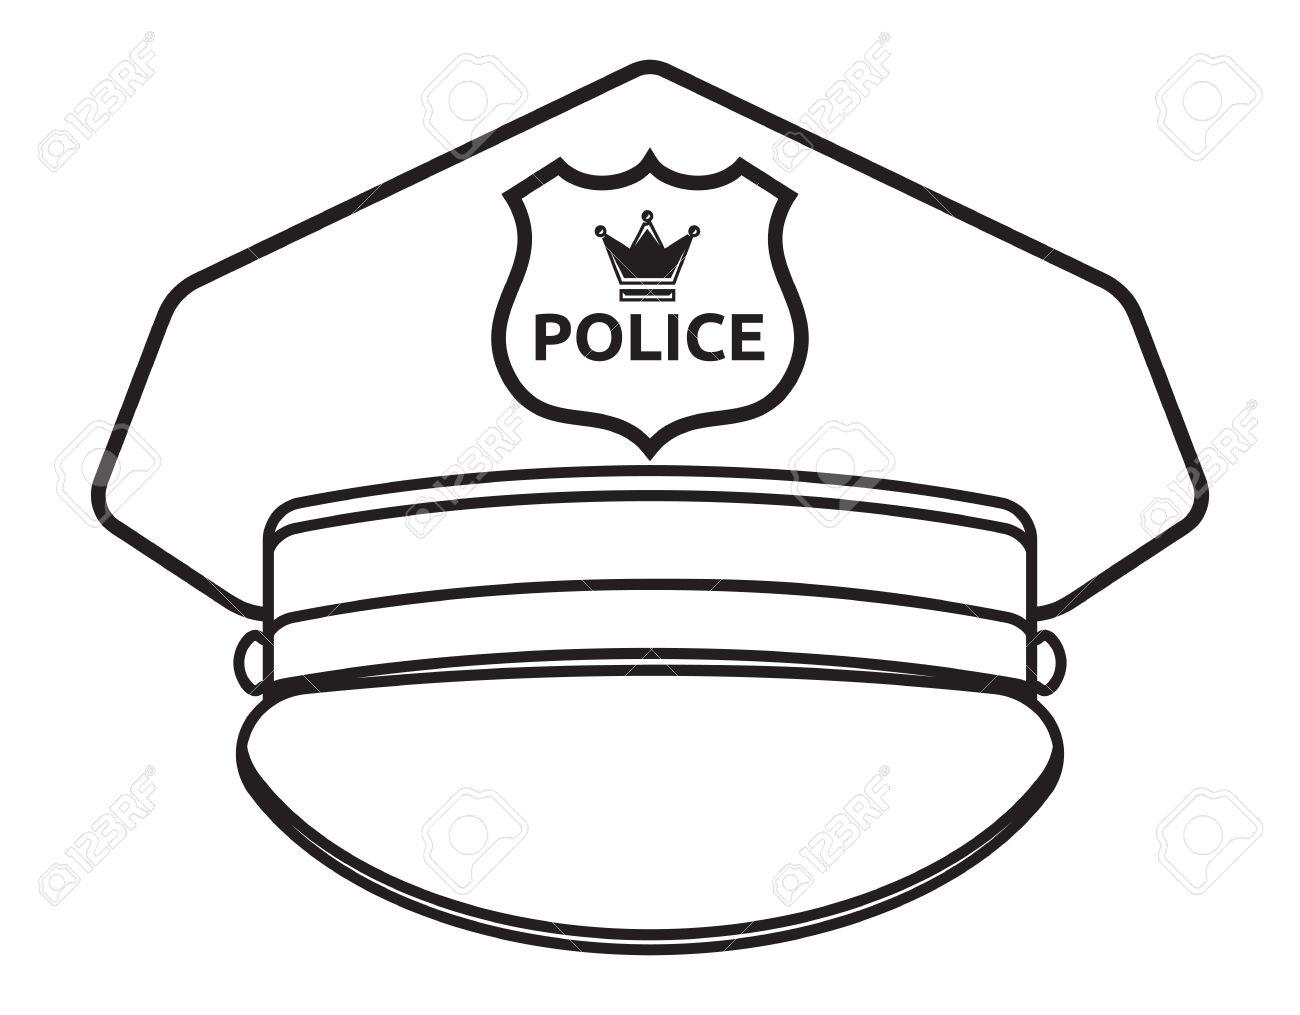 1300x1015 Police Cap Vector Illustration Royalty Free Cliparts, Vectors,